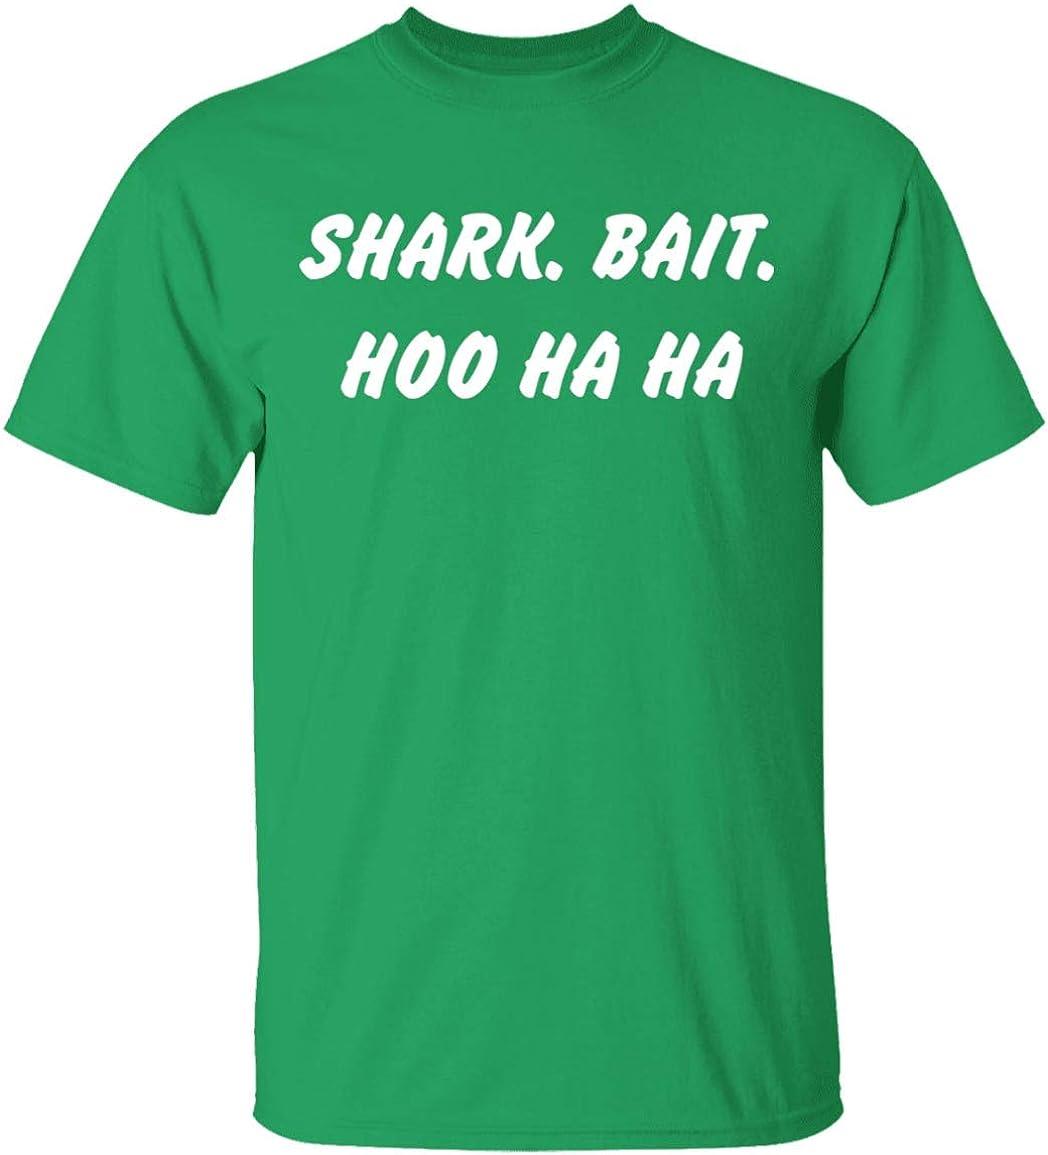 Cool Shark Bait Hoo Ha Ha Funny Finding Nemo Inspired Custom Comedy Handmade T-Shirt Retro Sitcom Finding Nemo T-Shirt